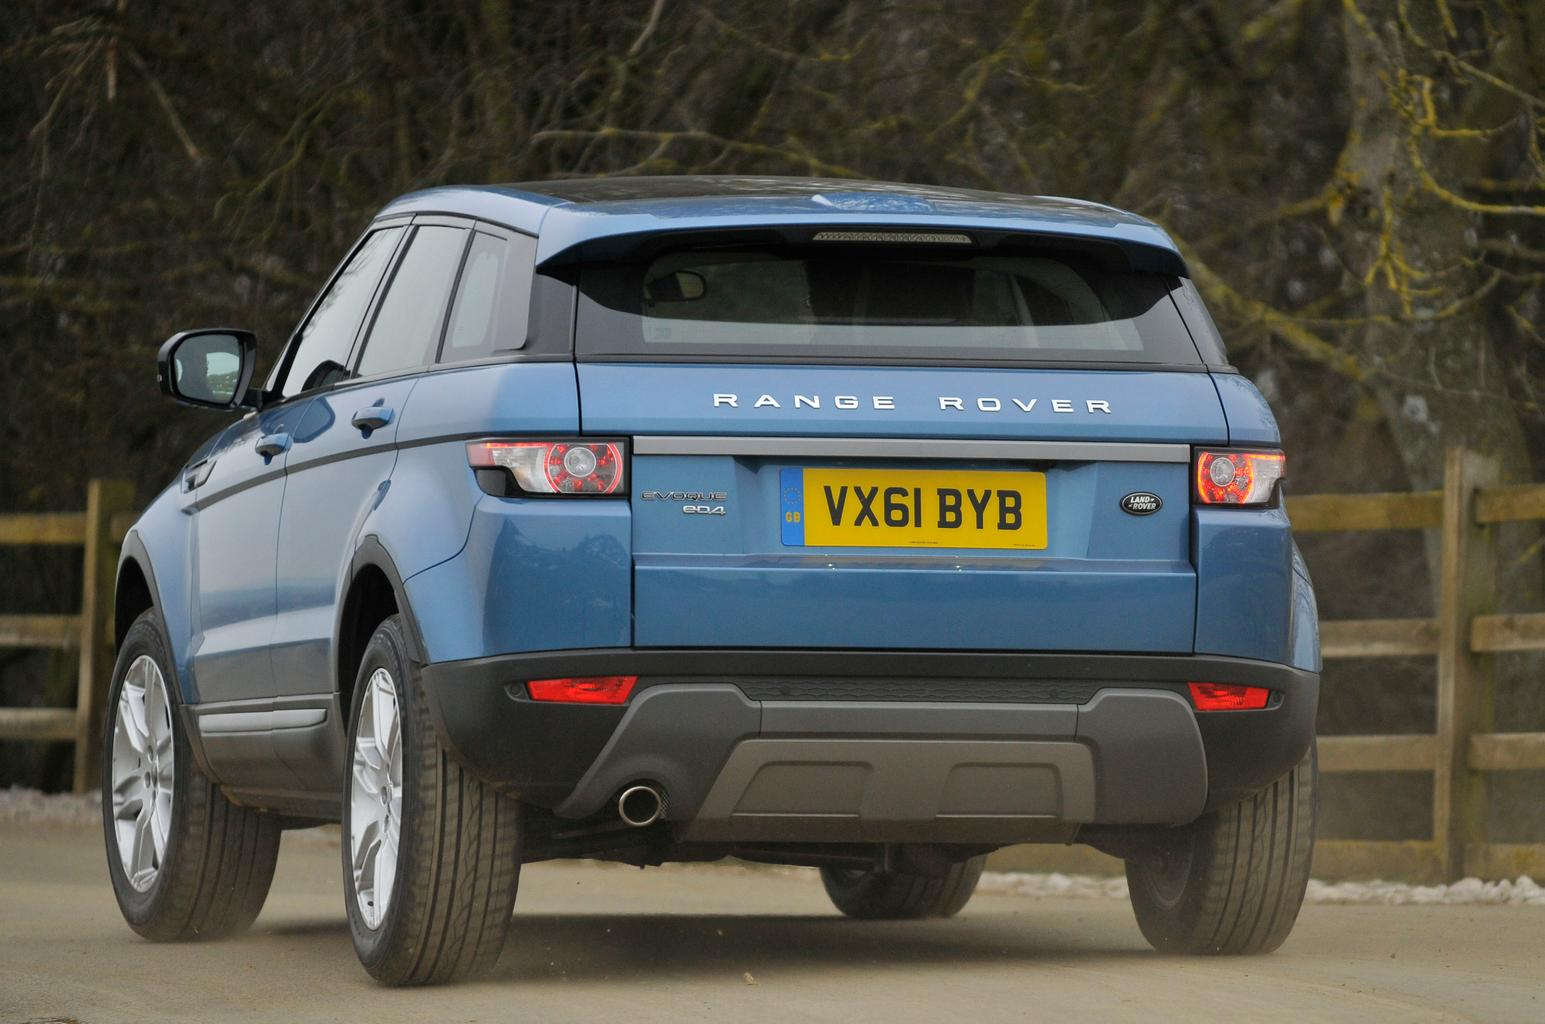 Used Audi A5 Sportback vs Chevrolet Volt vs Range Rover Evoque